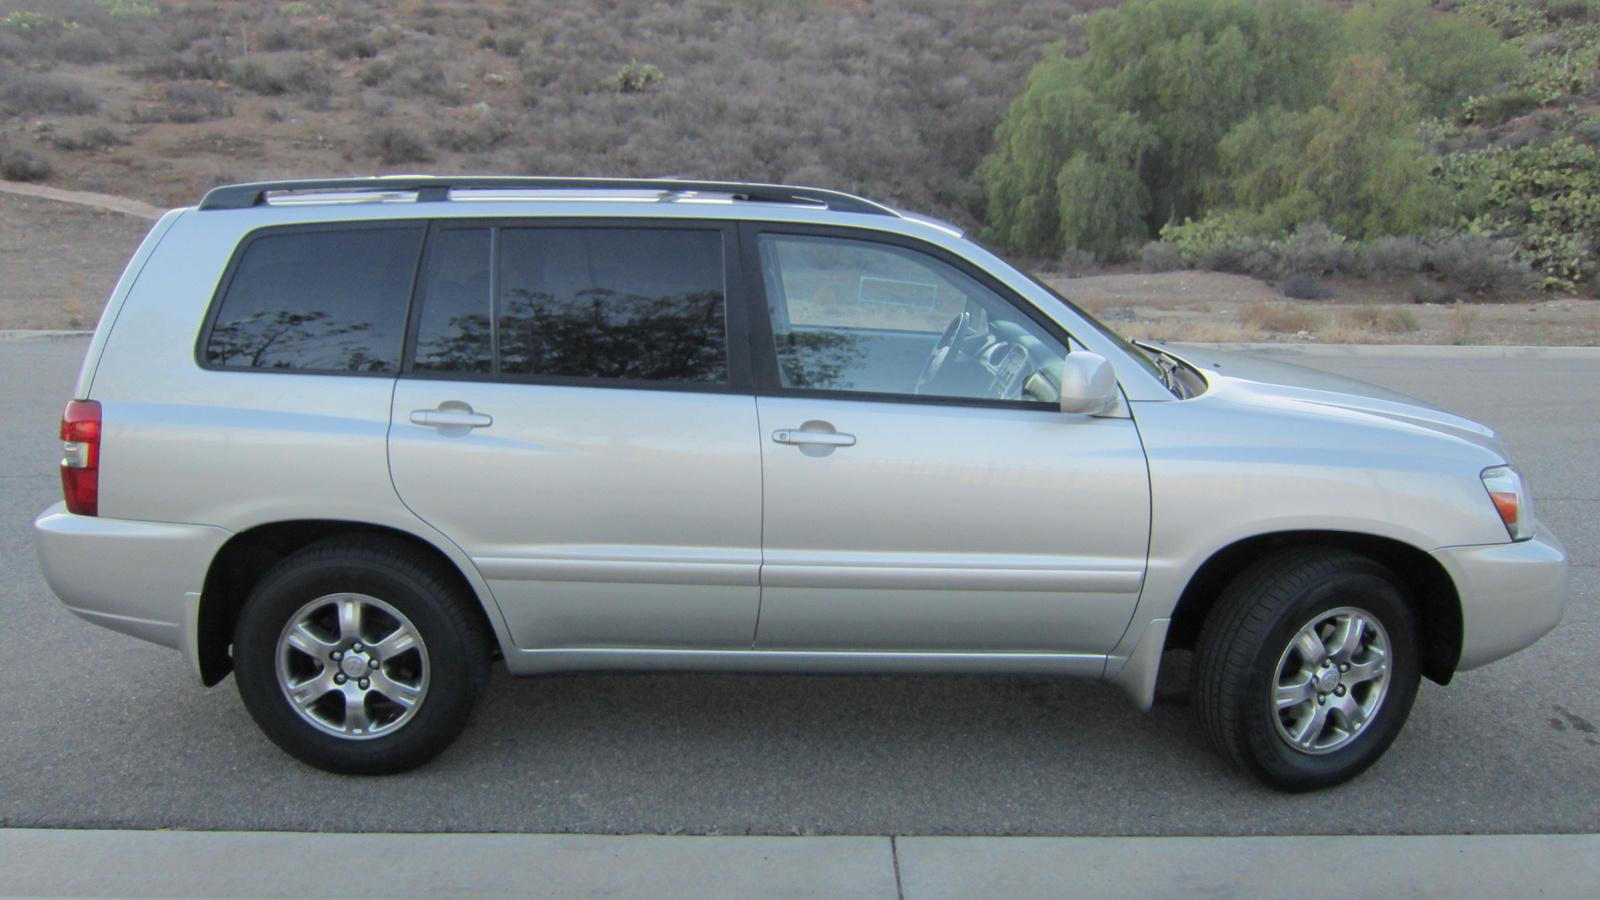 2005 Highlander Toyota